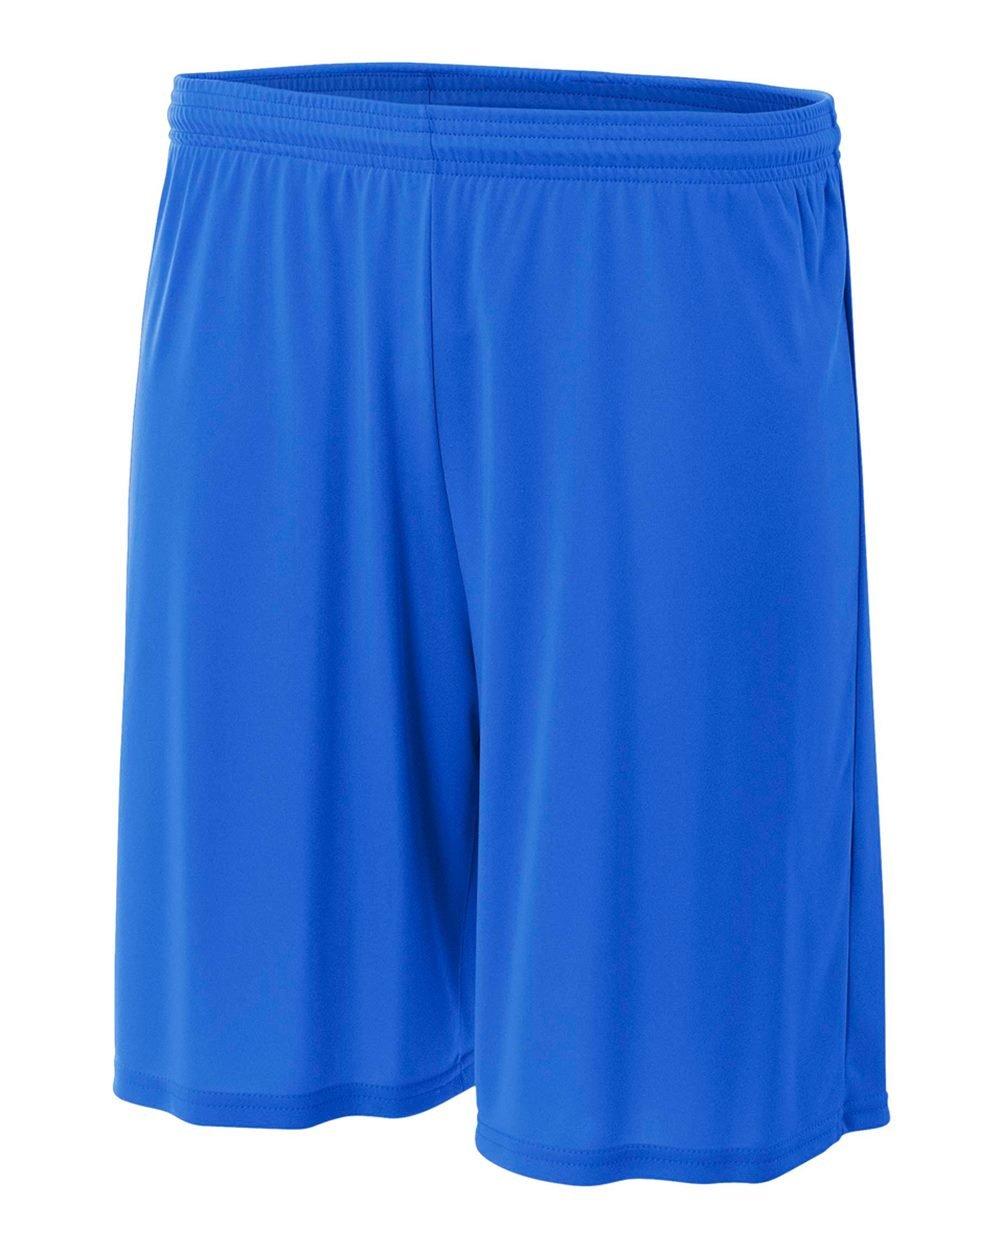 A4 A4 A4 22,9 cm Kühlleistung Shorts B00BBRBPOG Shorts Aktuelle Form e6b6a6